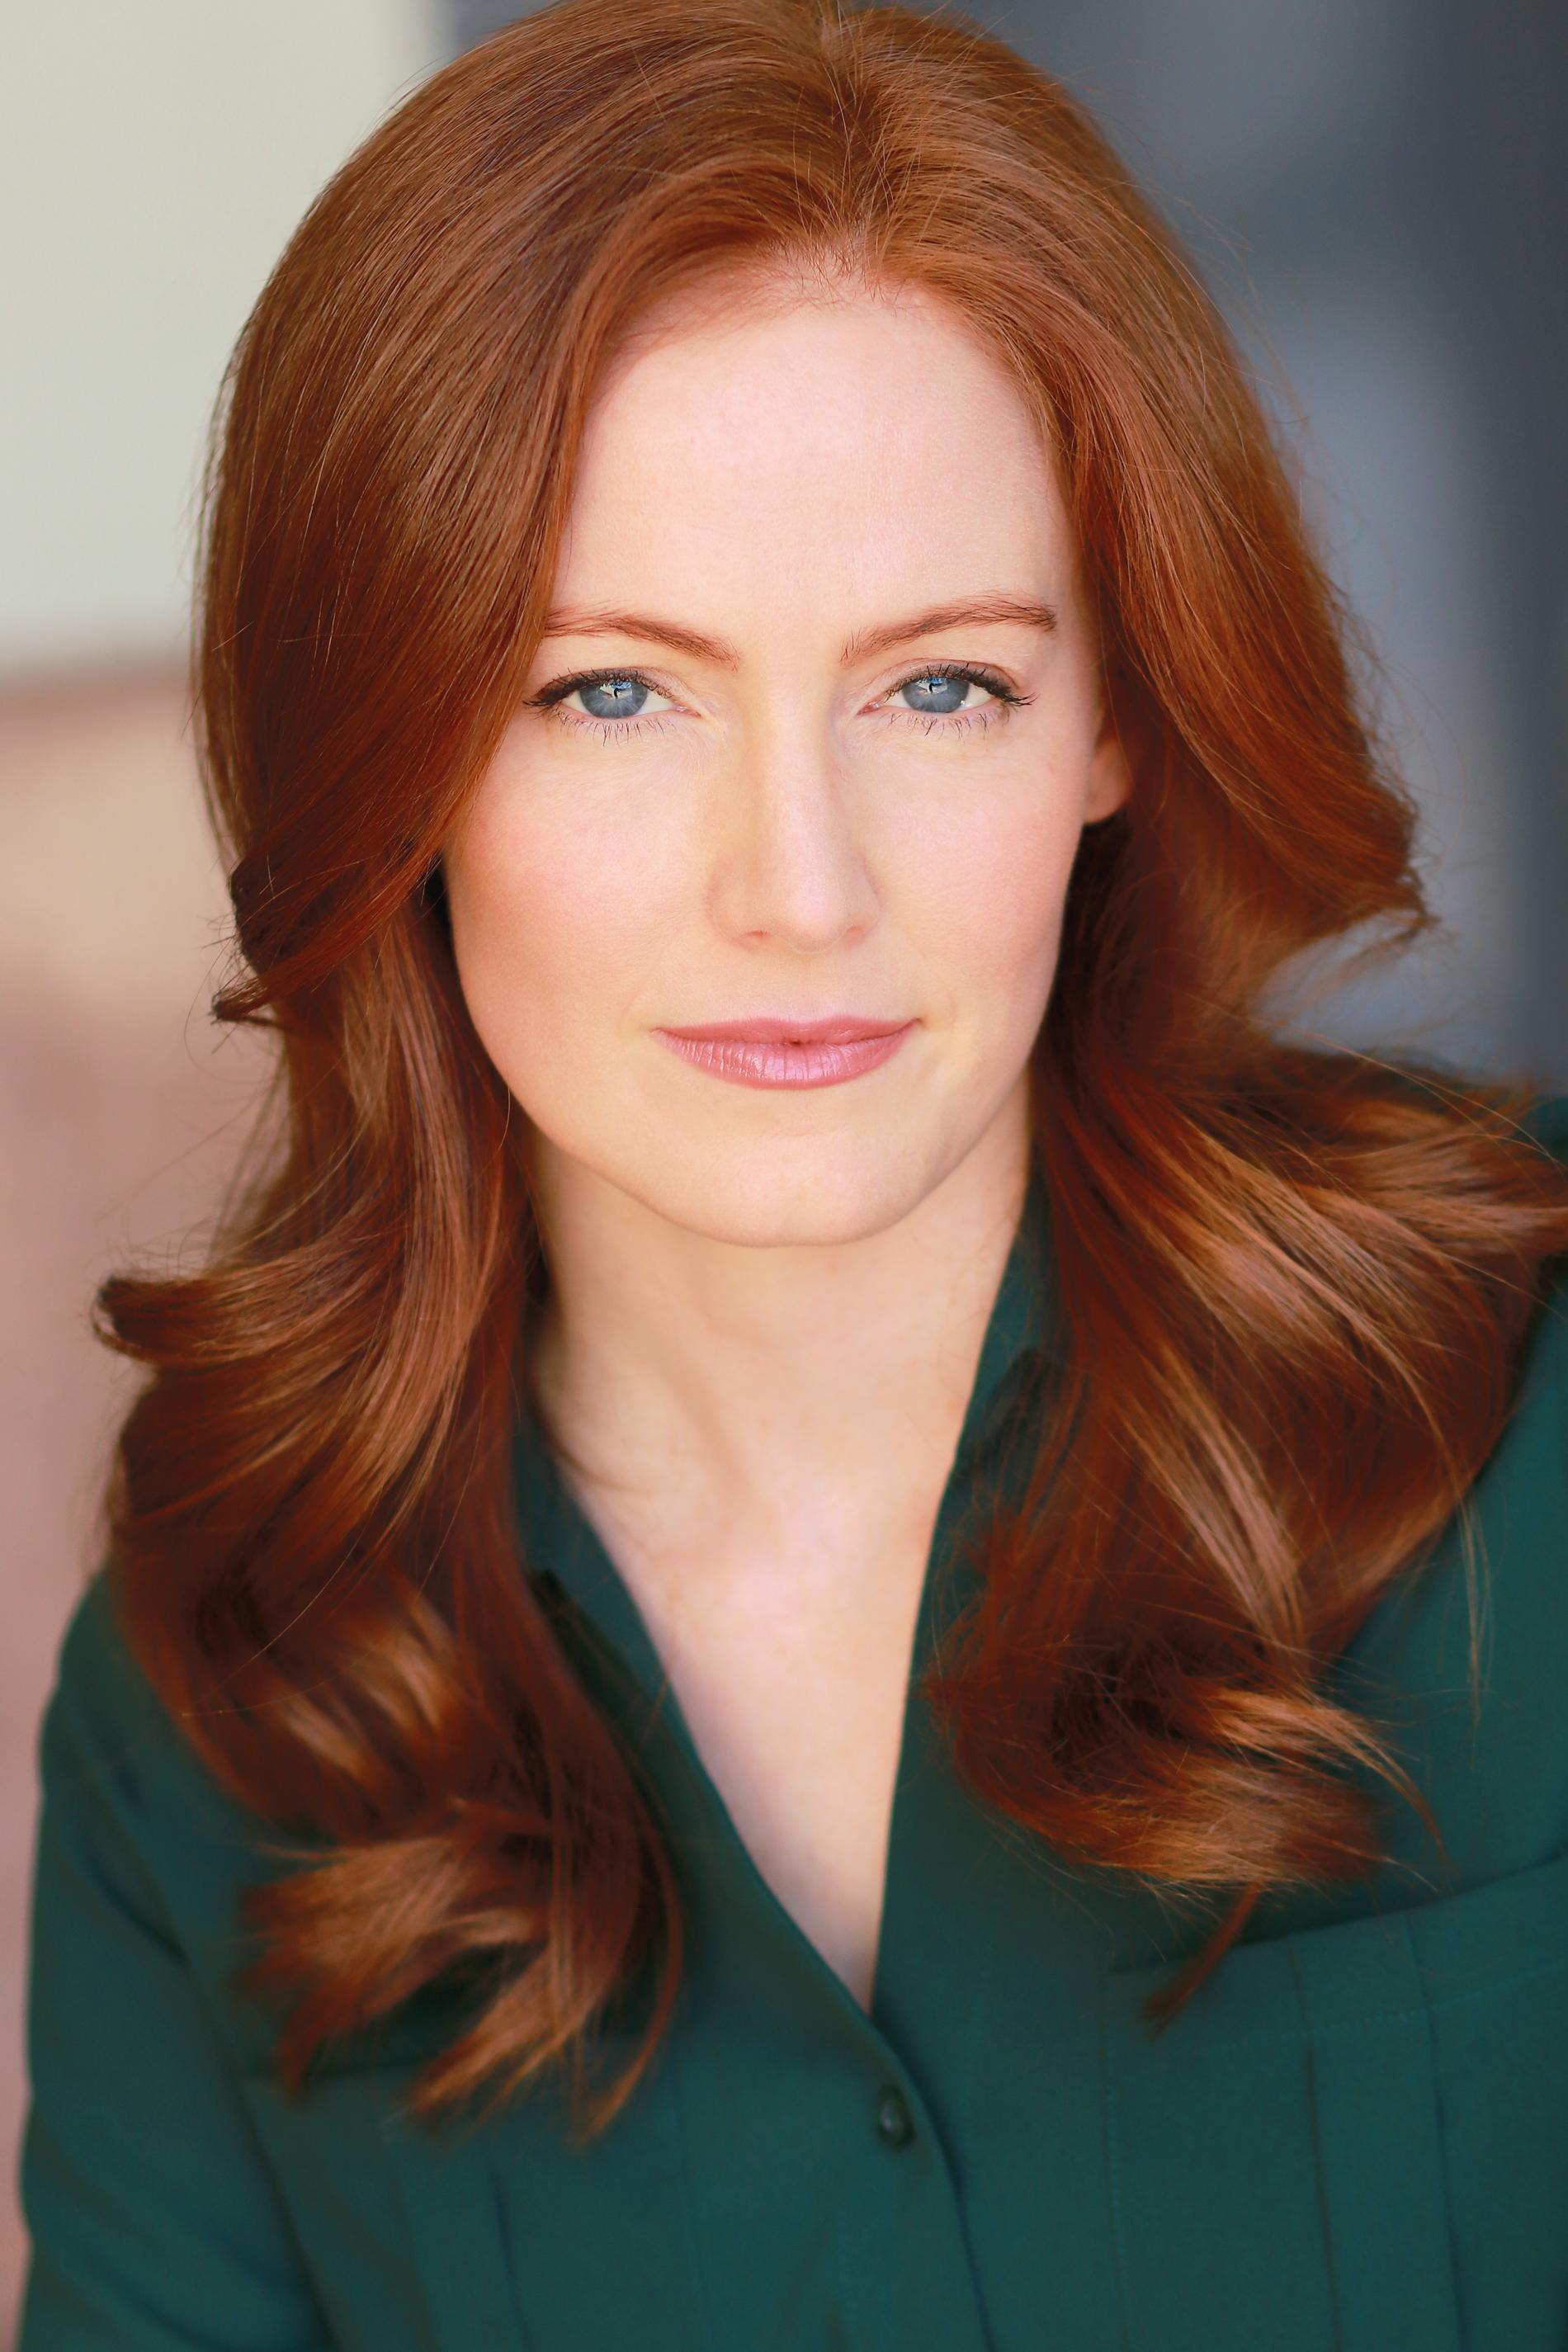 Danielle Brewer